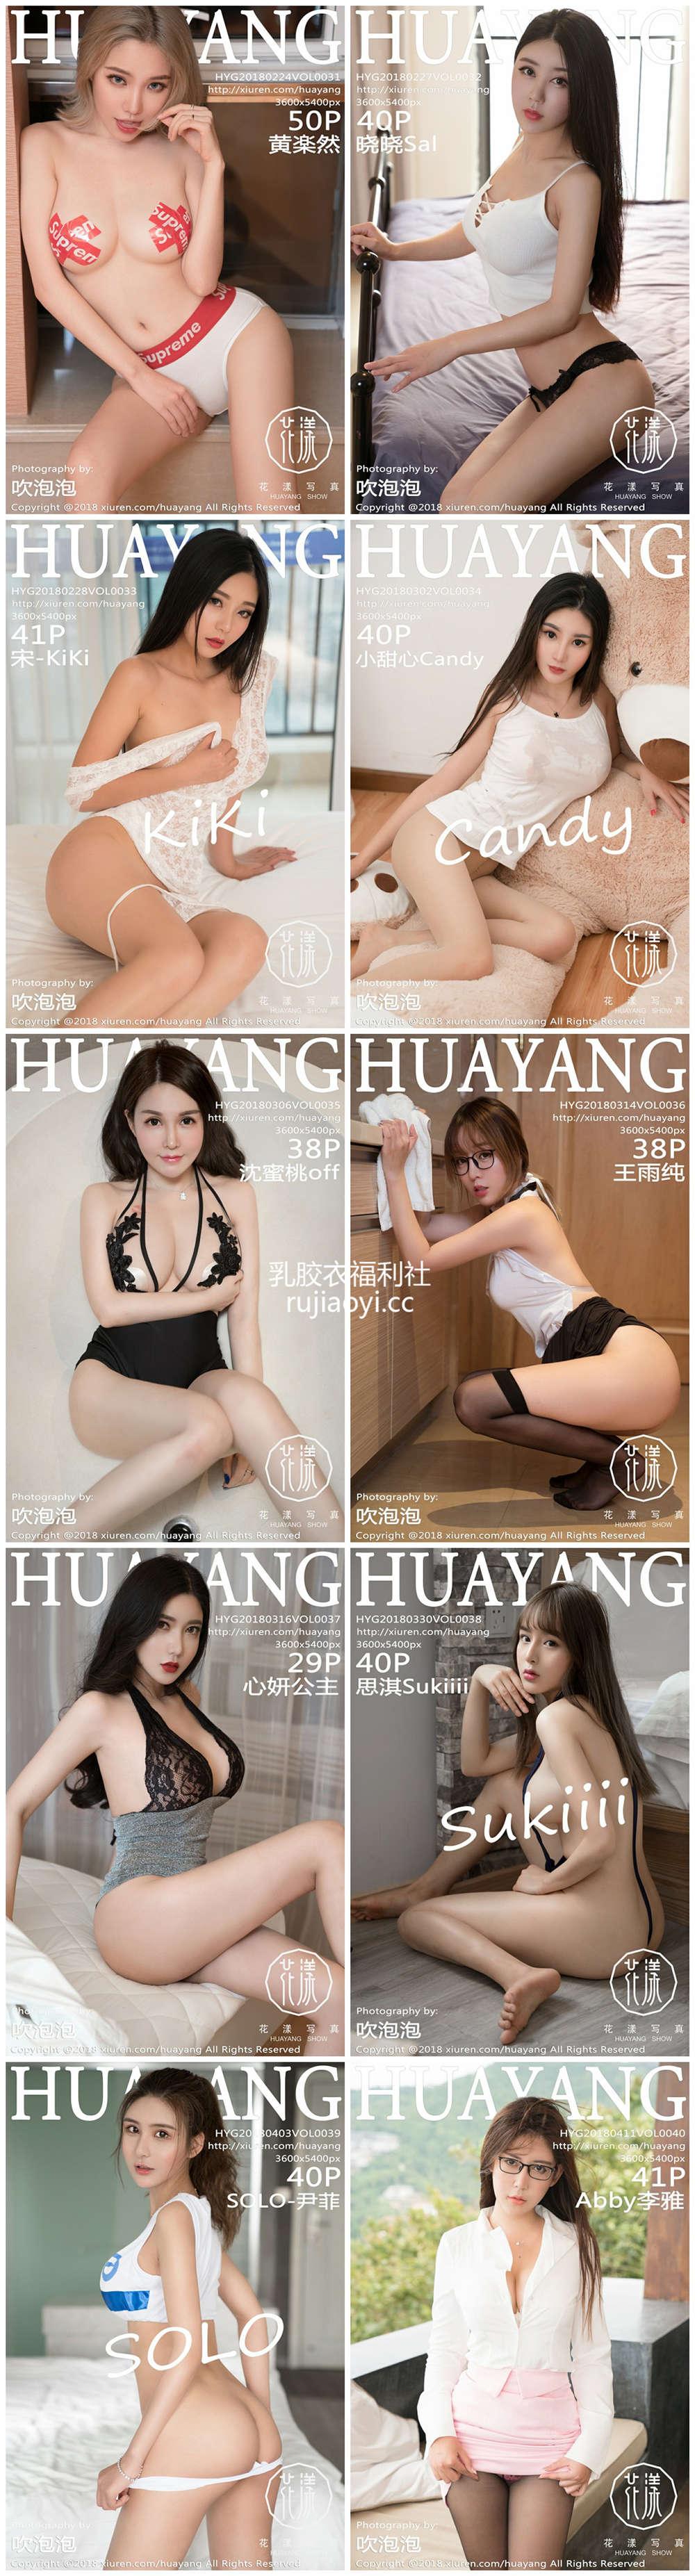 [HuaYang花漾] Vol.031-040 秀人系列 10期性感写真百度云合集下载